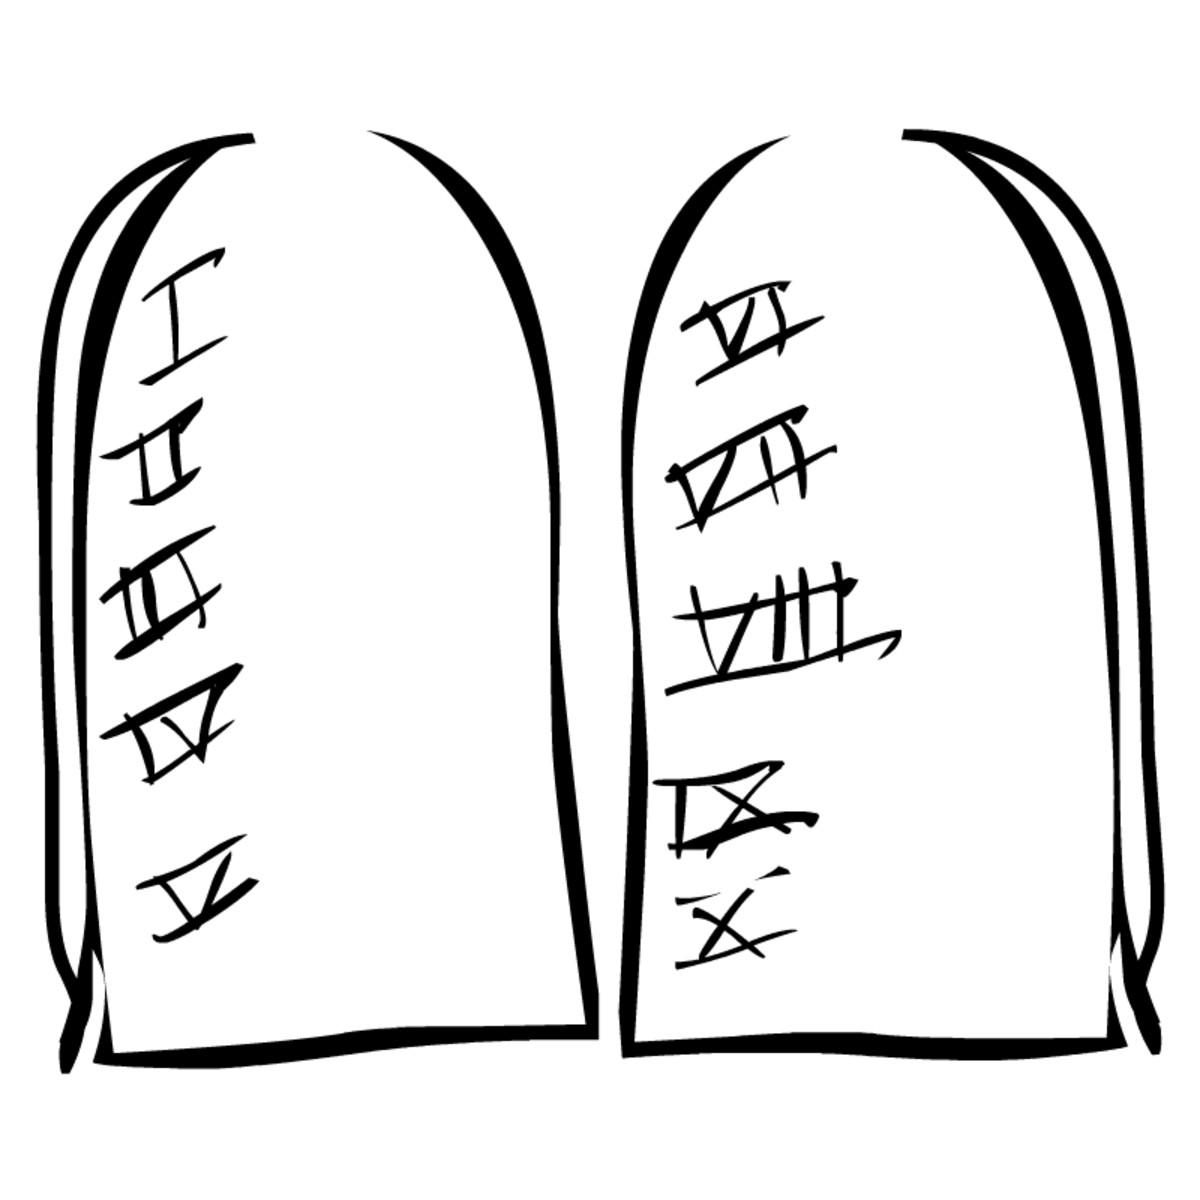 Fuller's (Eight) Ten Commandments of Procedural Law.